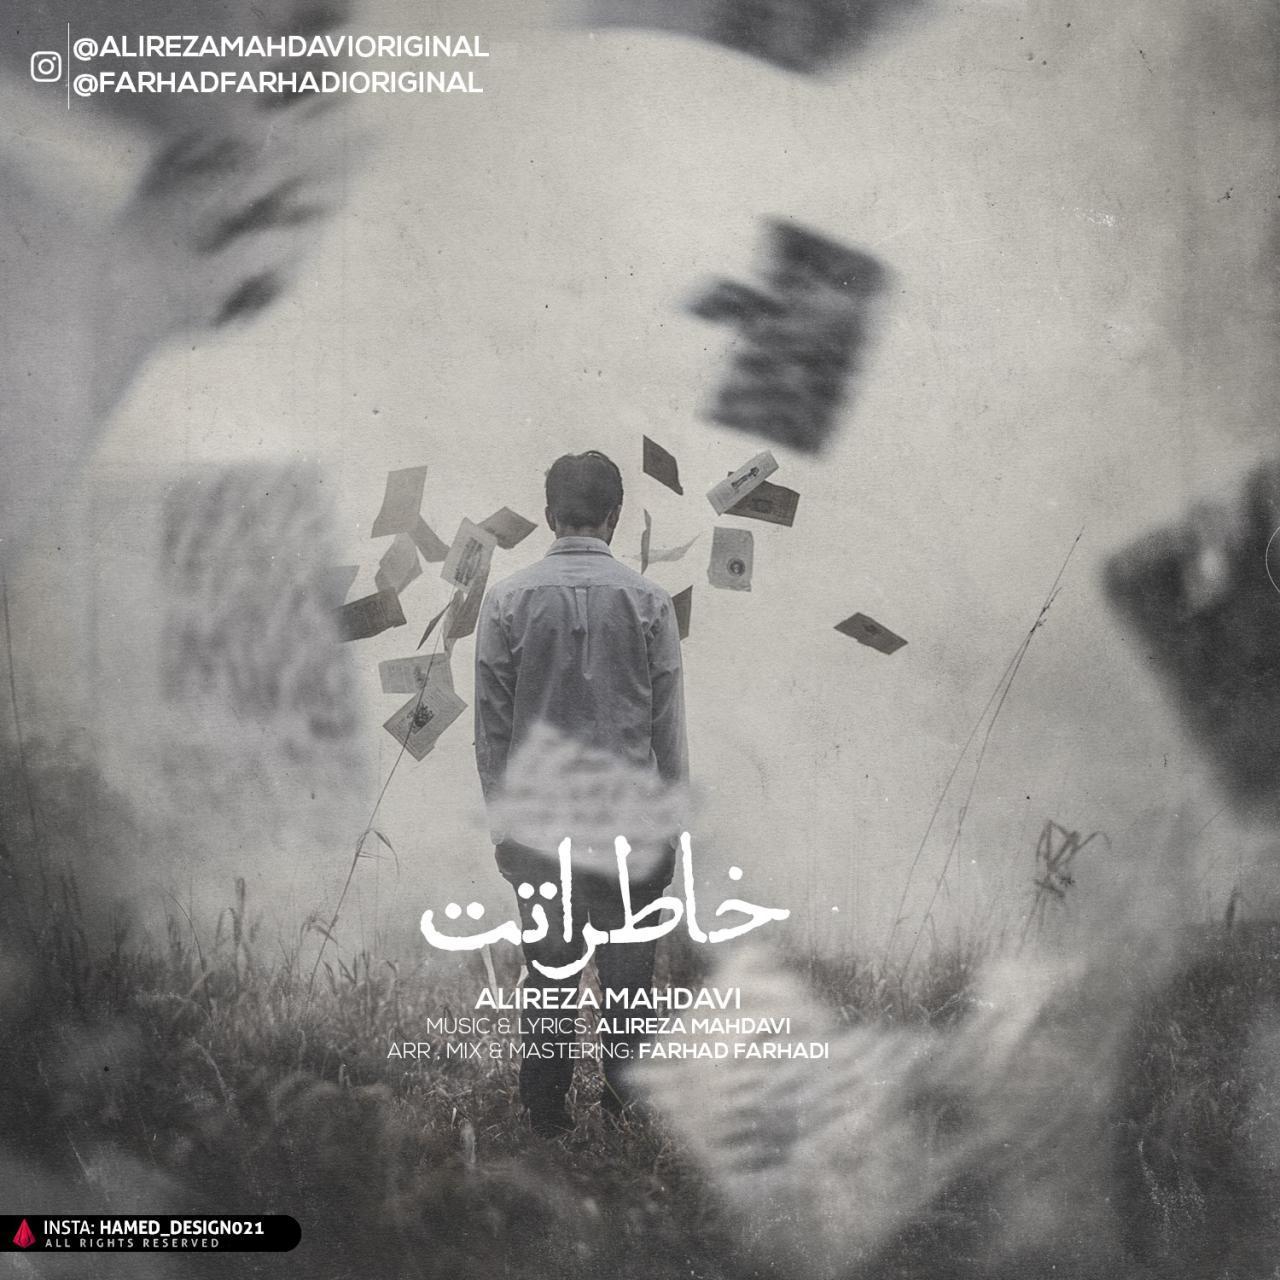 Alireza Mahdavi – Khateratet